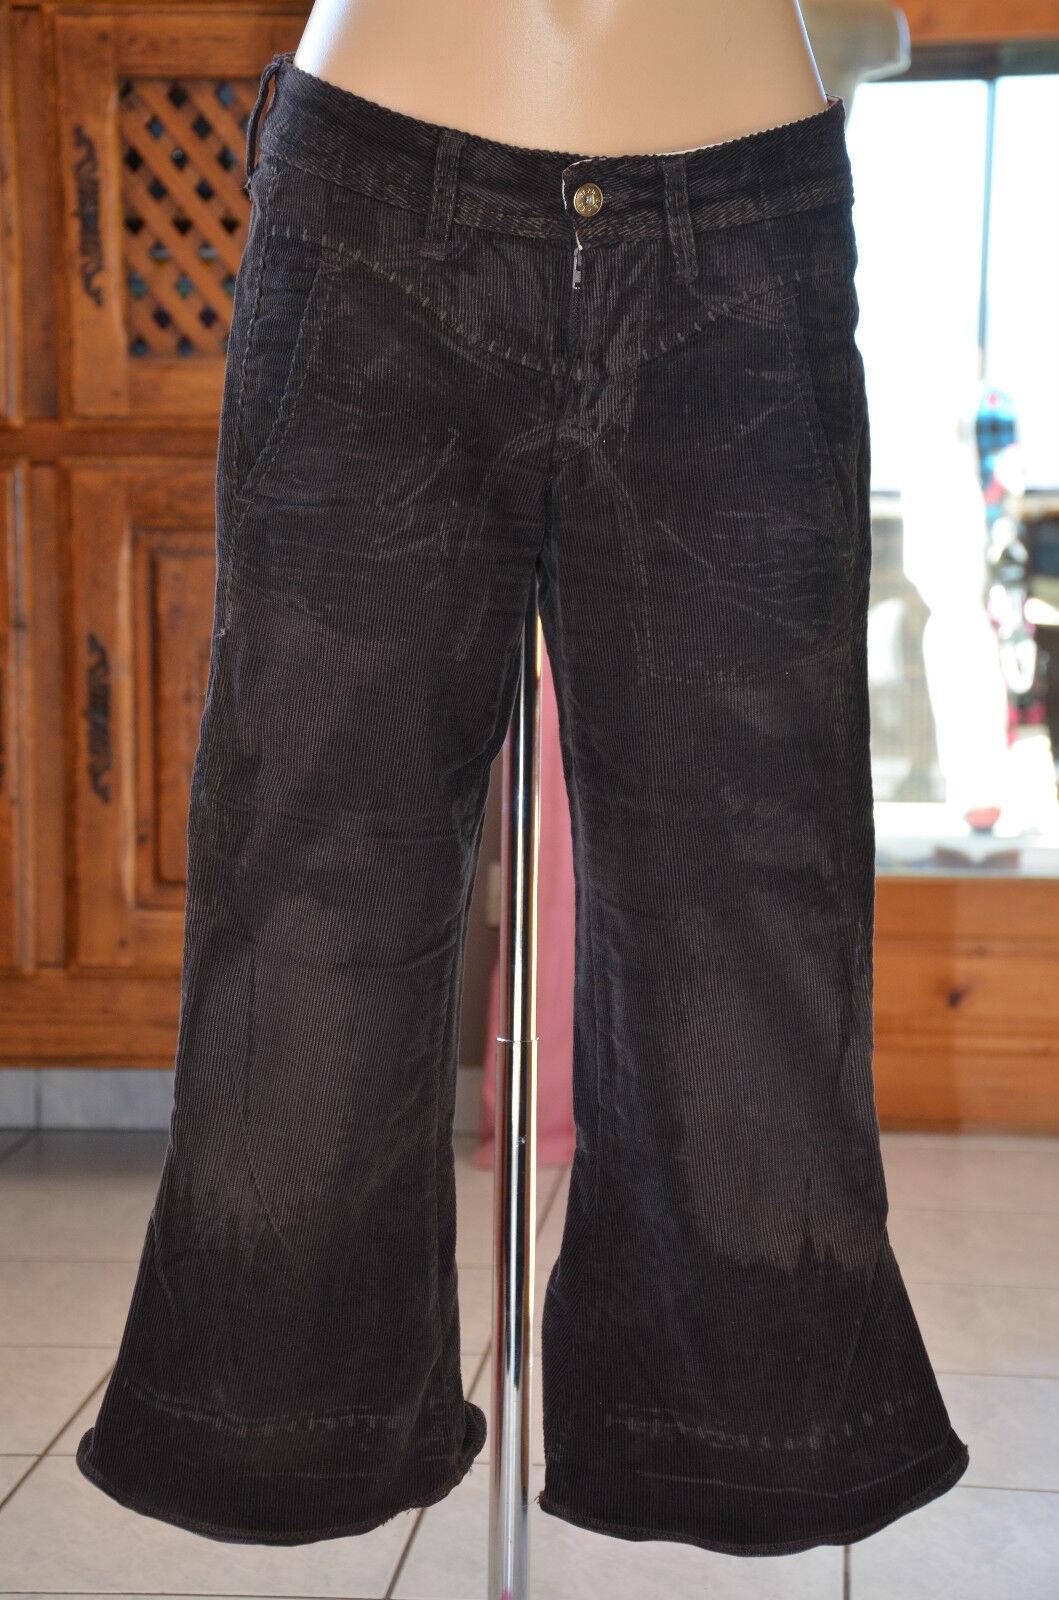 MARITHÉ FRANCOIS GIRBAUD Three quarter pants brown Size 36 - W 25- MINT